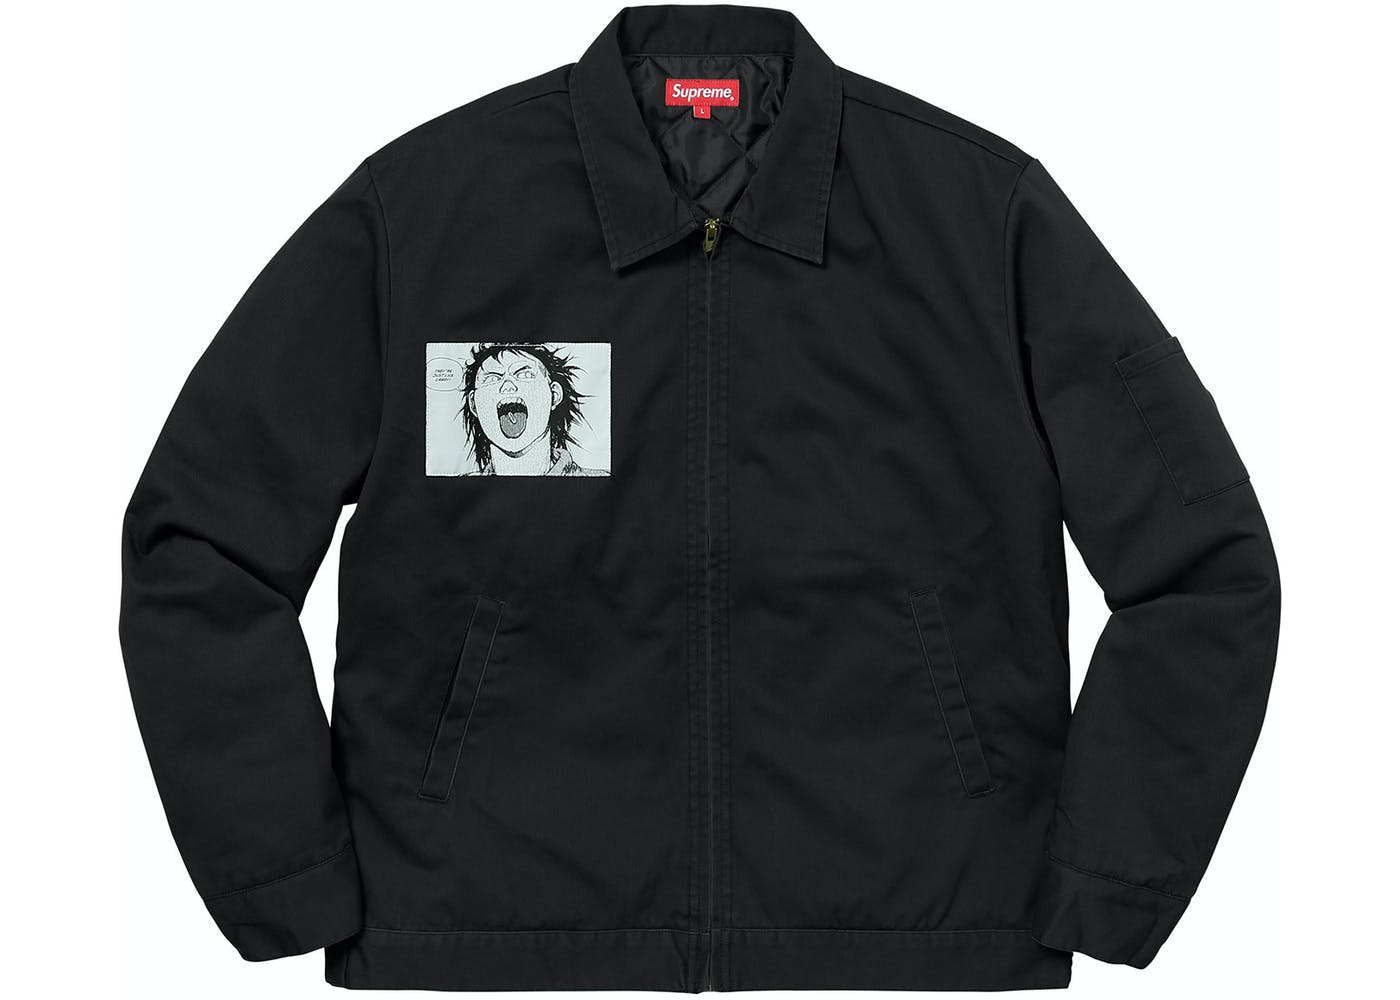 Supreme Akirasupreme Work Jacket Black